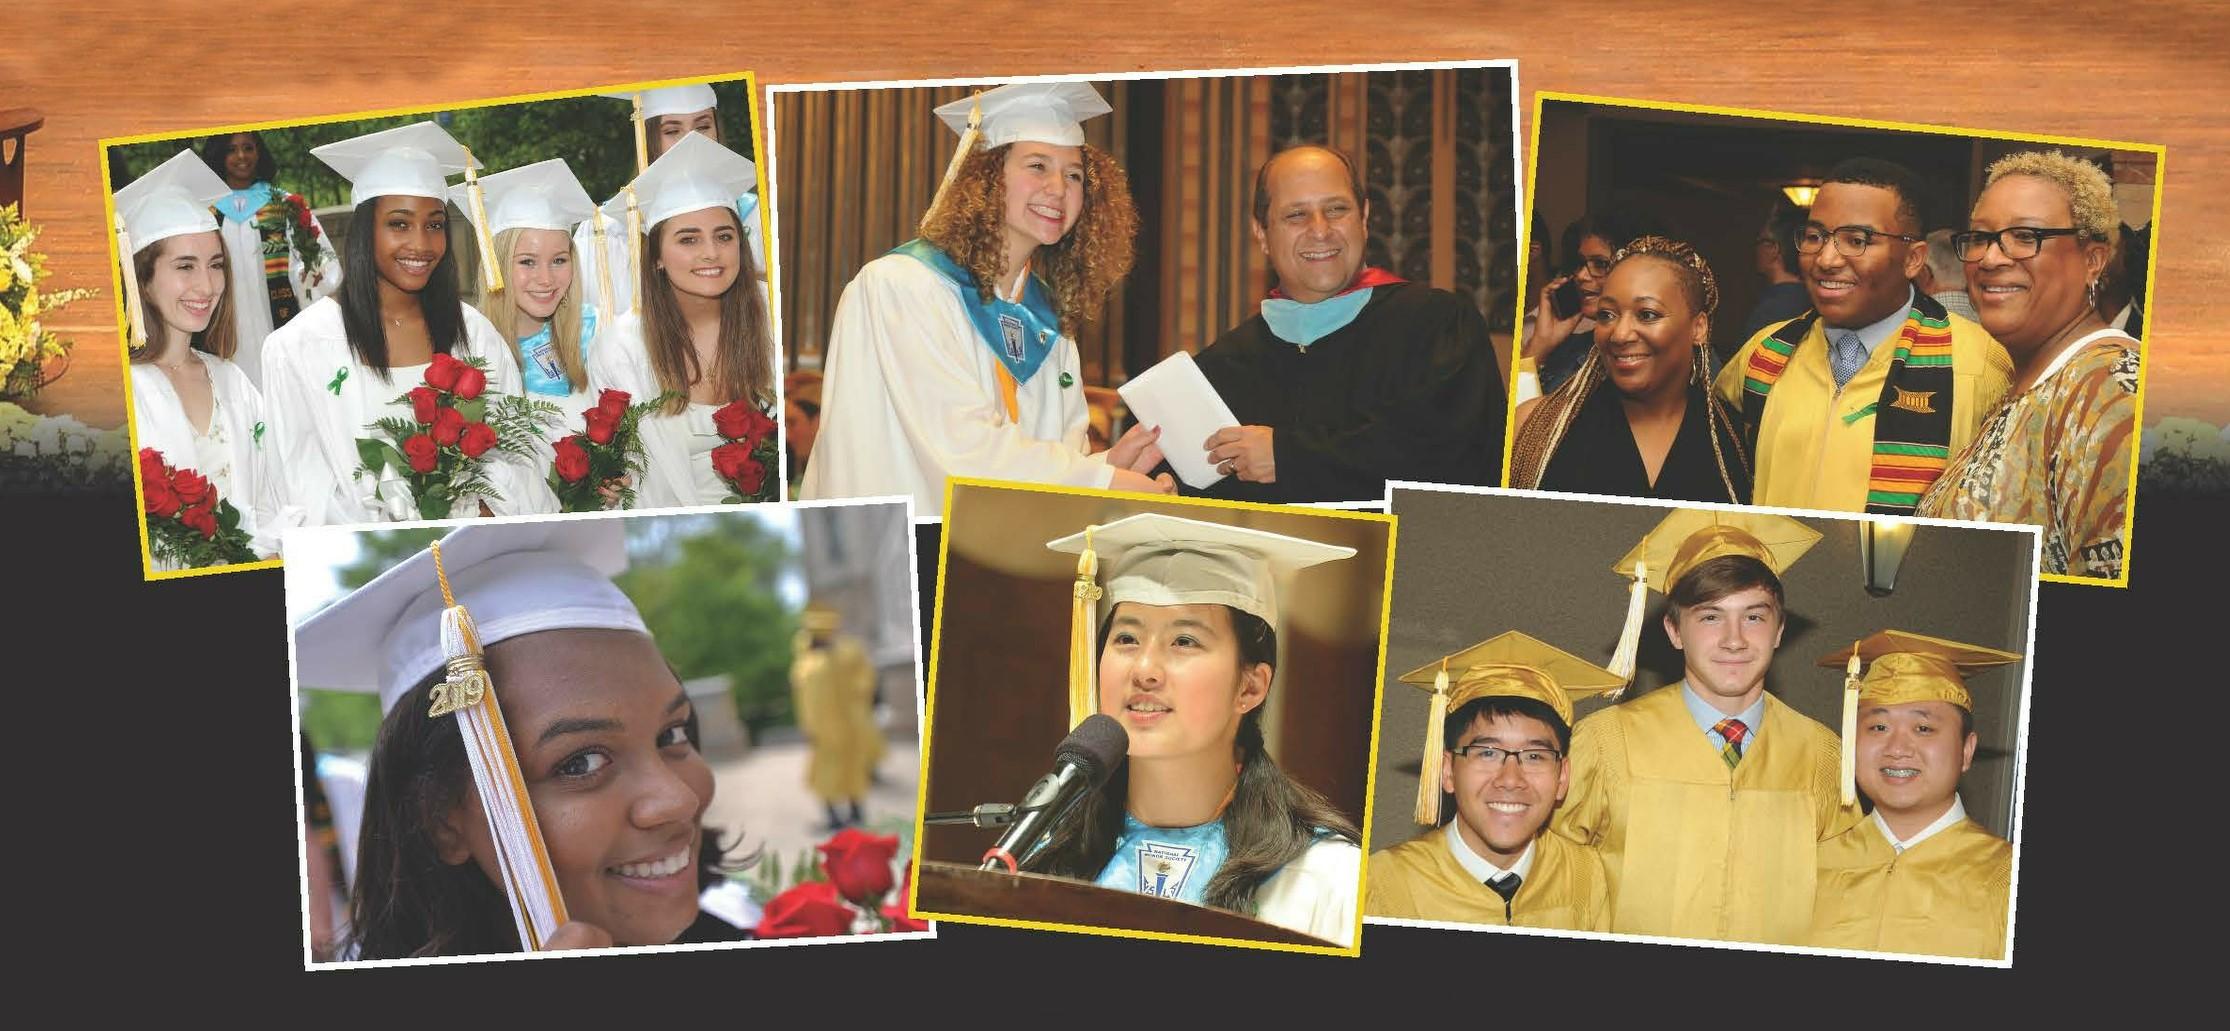 Embedded Image for:  (2019 graduation  facebook cover3.jpg)